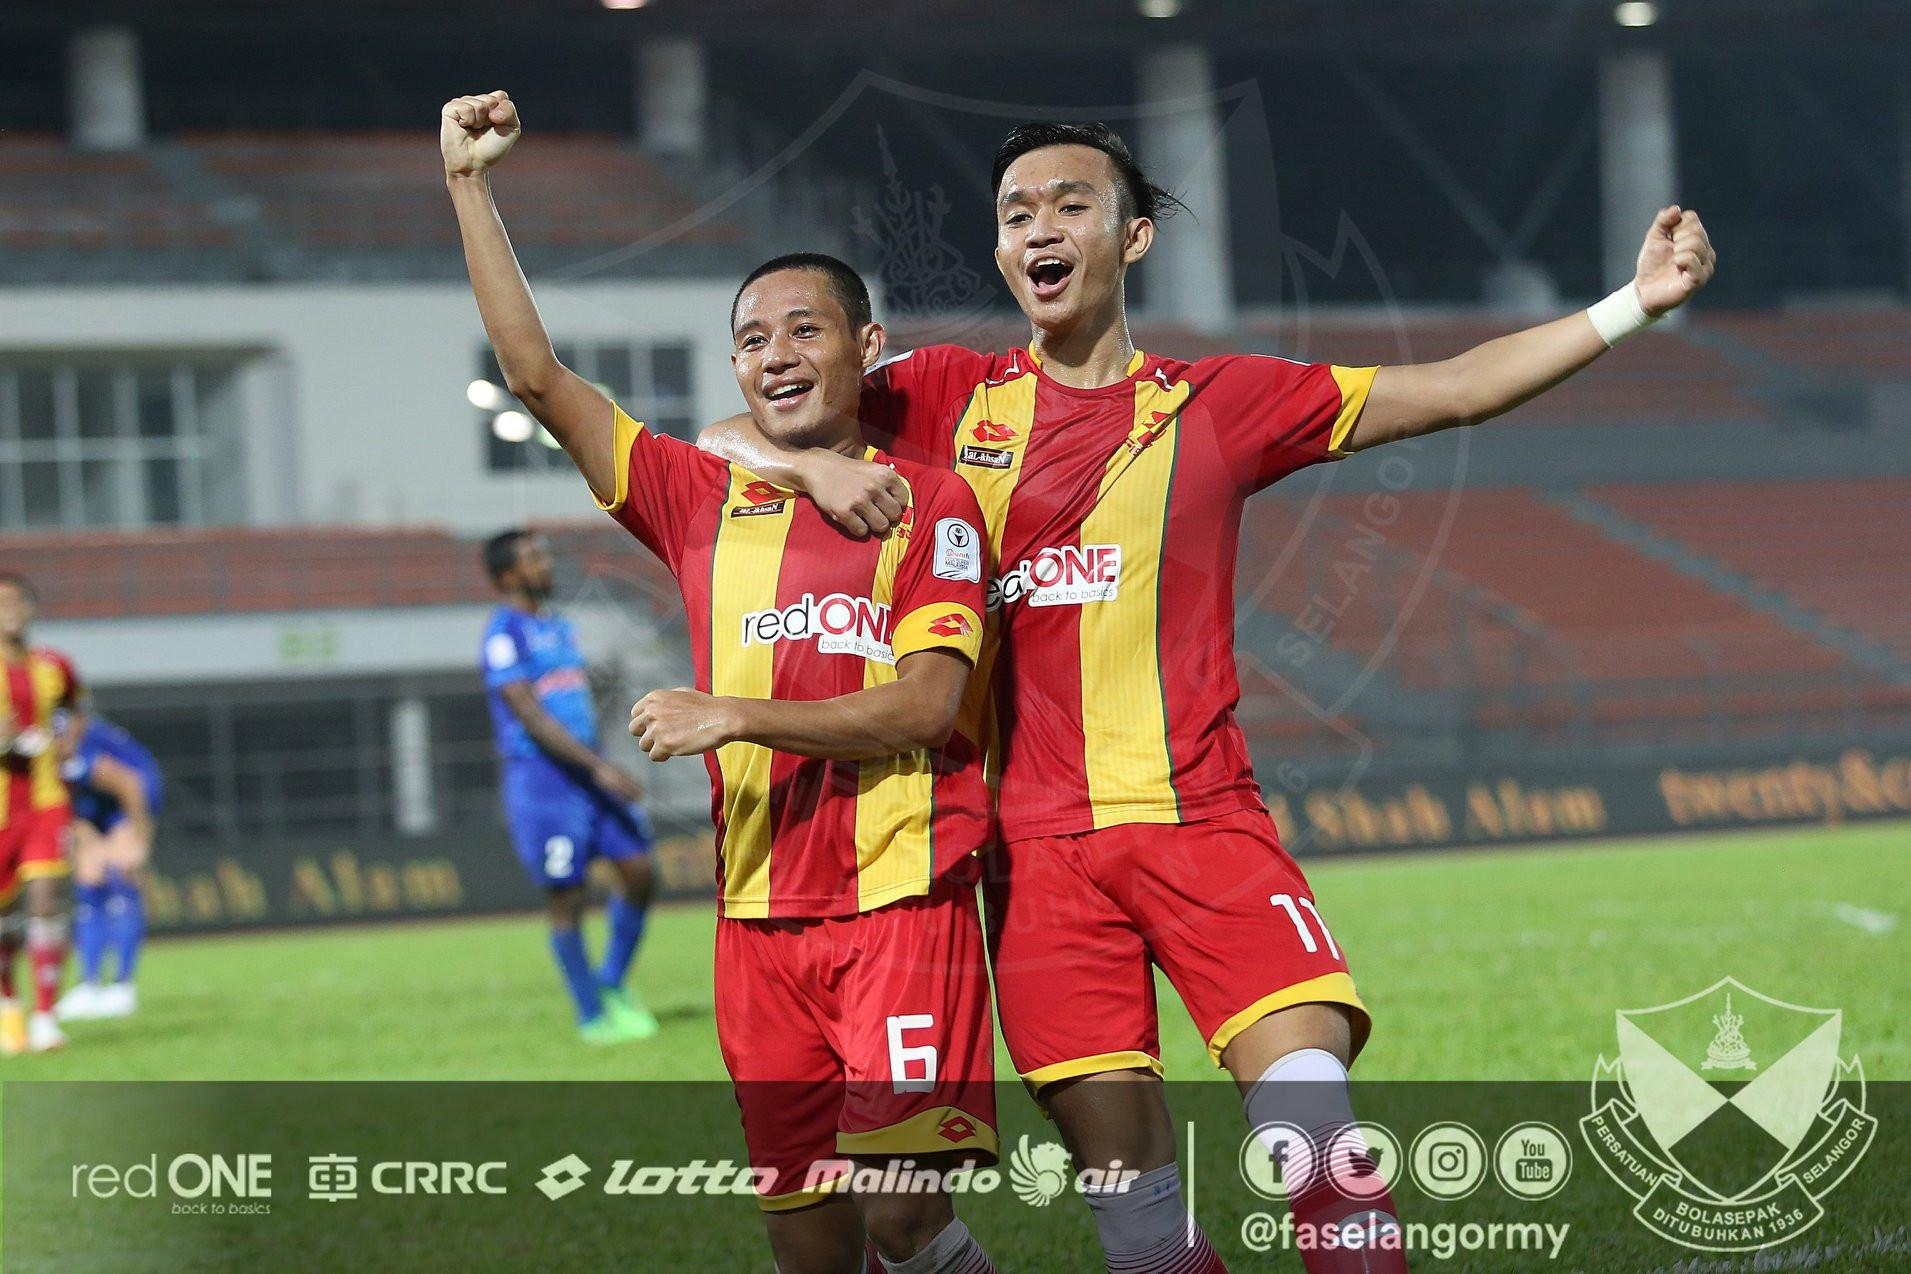 Gelandang Selangor FA, Evan Dimas, merayakan gol yang dicetaknya ke gawang PKNS FC pada laga lanjutan Malaysia Super League 2018 di Stadion Cheras, Rabu (6/6/2018). (Dok. Selangor FA)